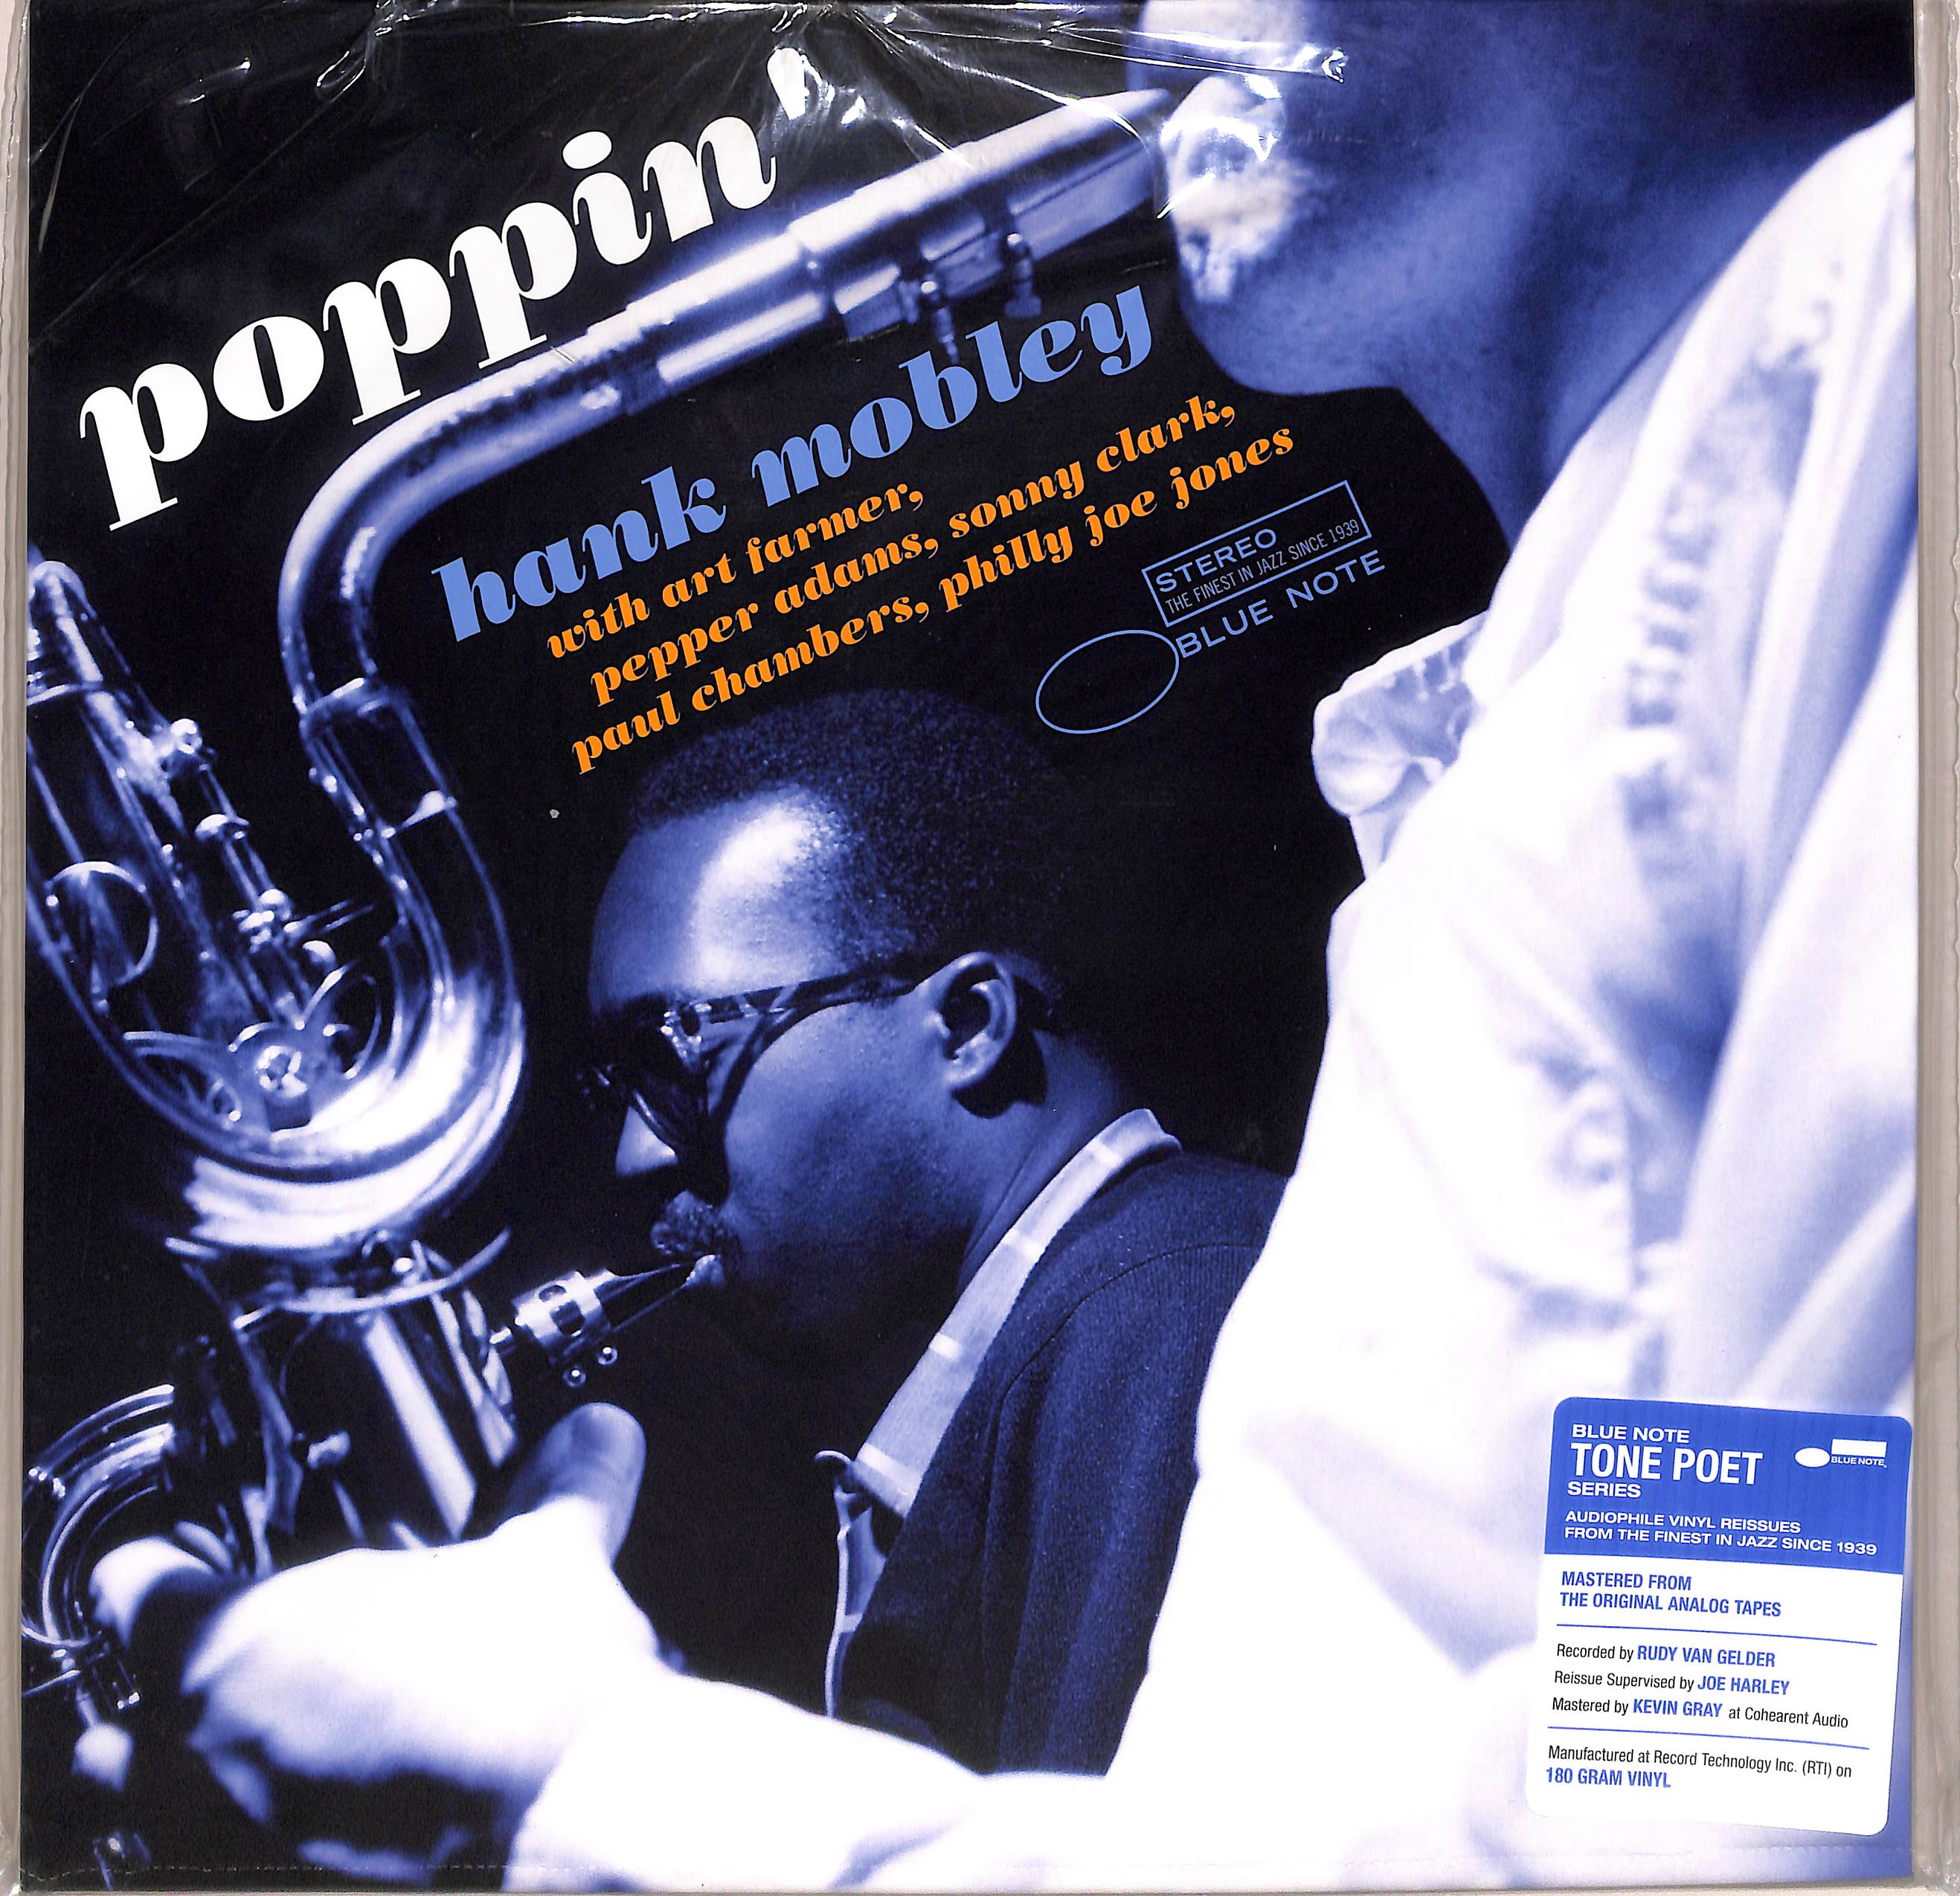 Hank Mobley - POPPIN